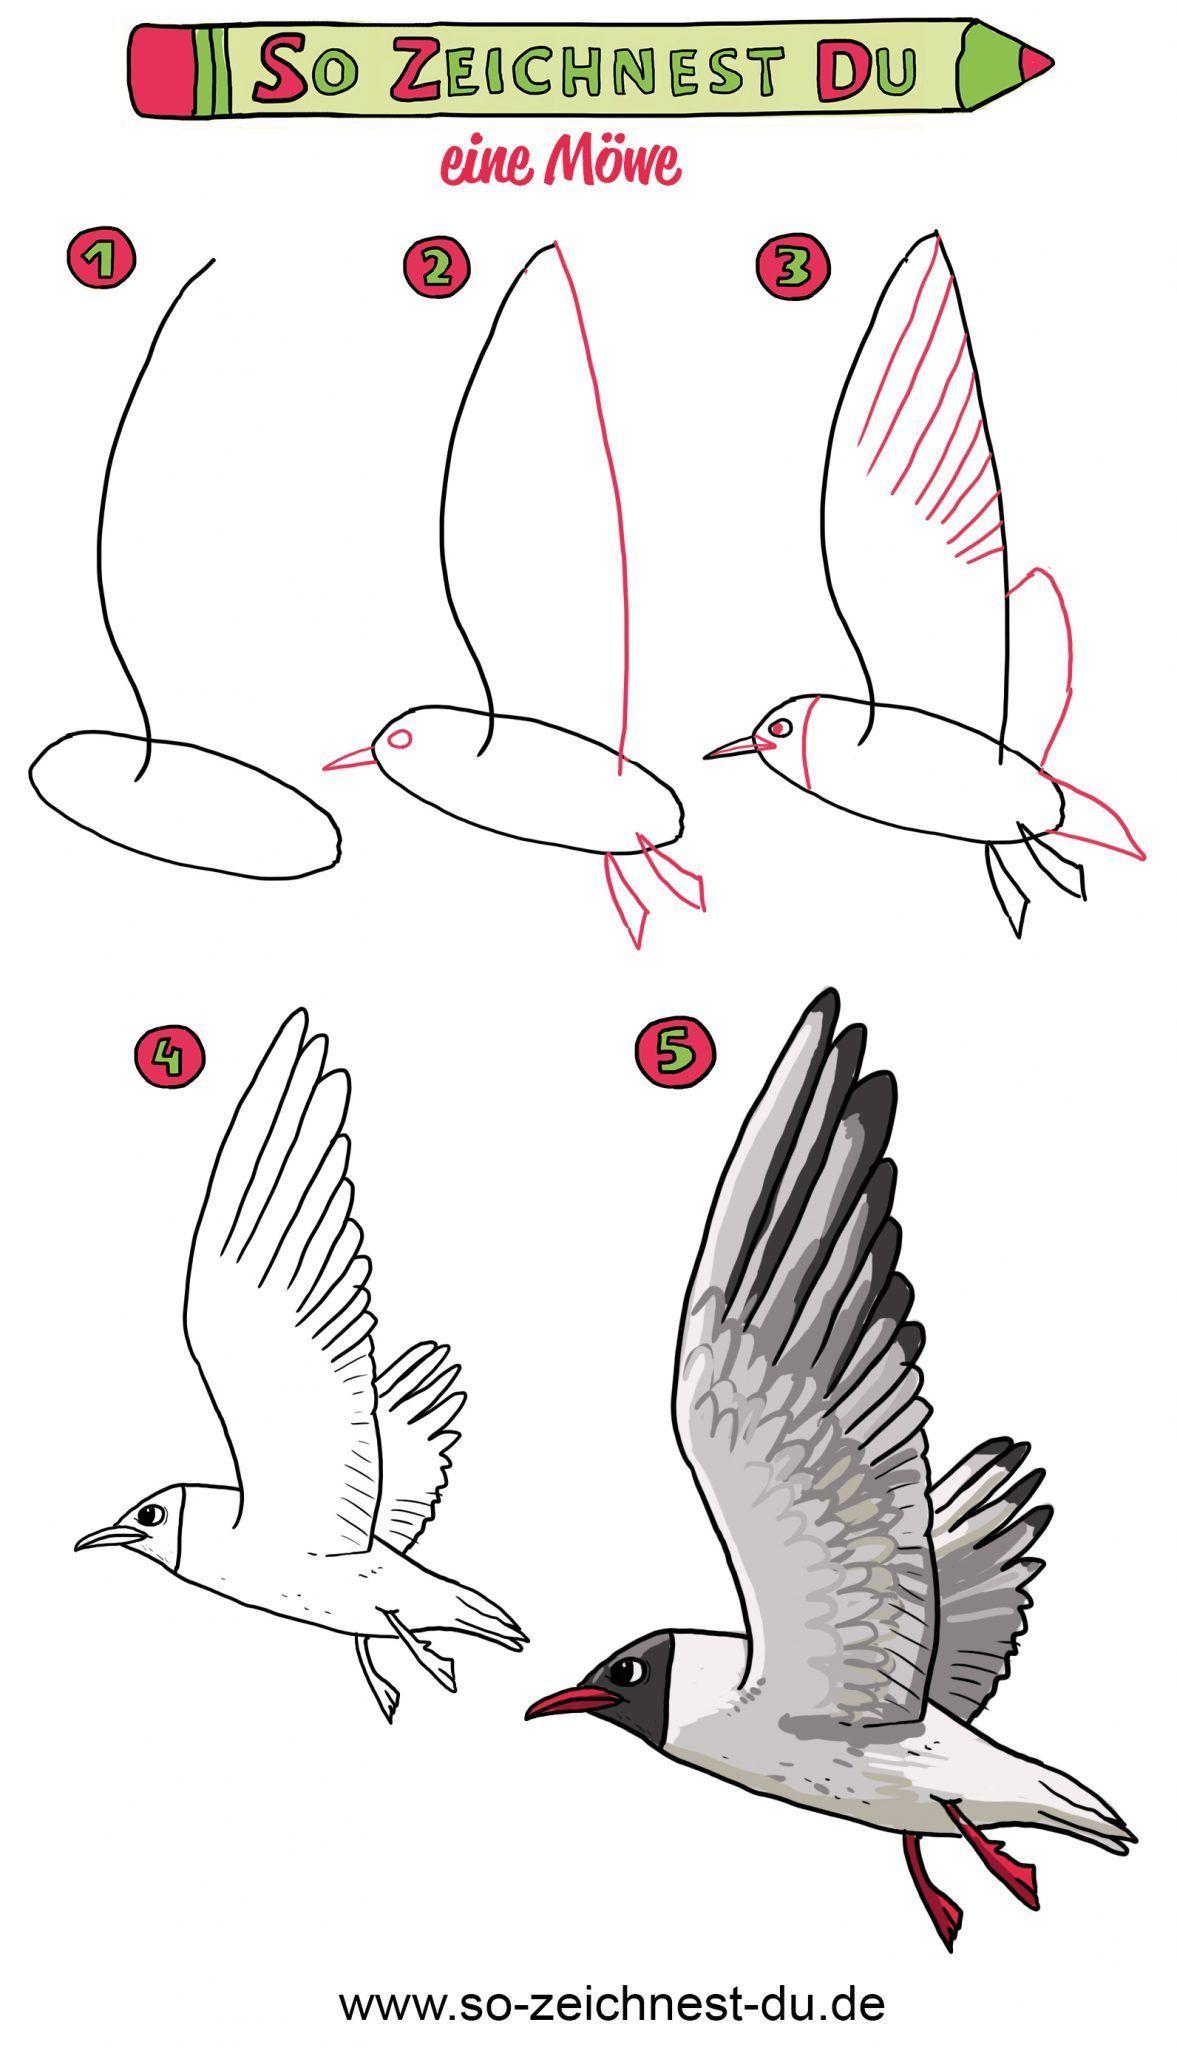 Mas Reciente Fotos Aves Ilustracion Digital Estrategias Dibuja Y Pinta Una Gaviota Paso A Dibujos De Pajaro Dibujo Paso A Paso Arte Ingenuo